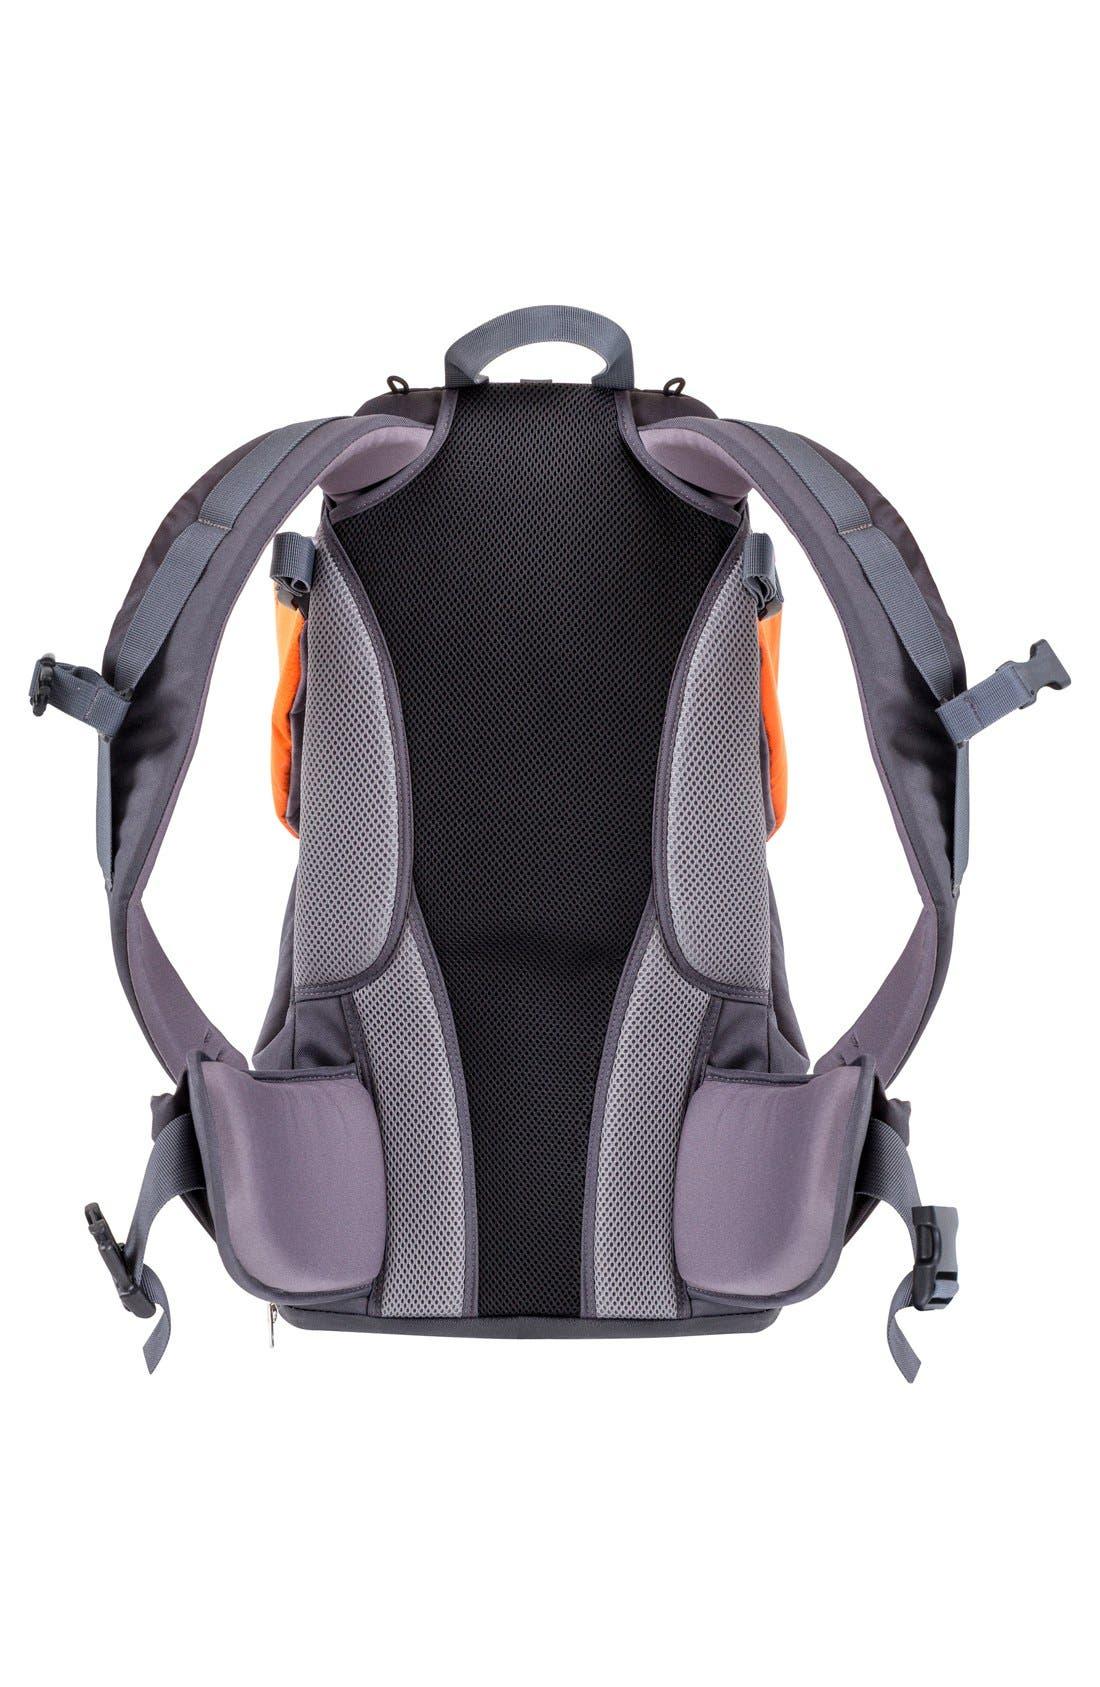 'Parade' Backpack Carrier,                             Alternate thumbnail 2, color,                             Orange/ Grey